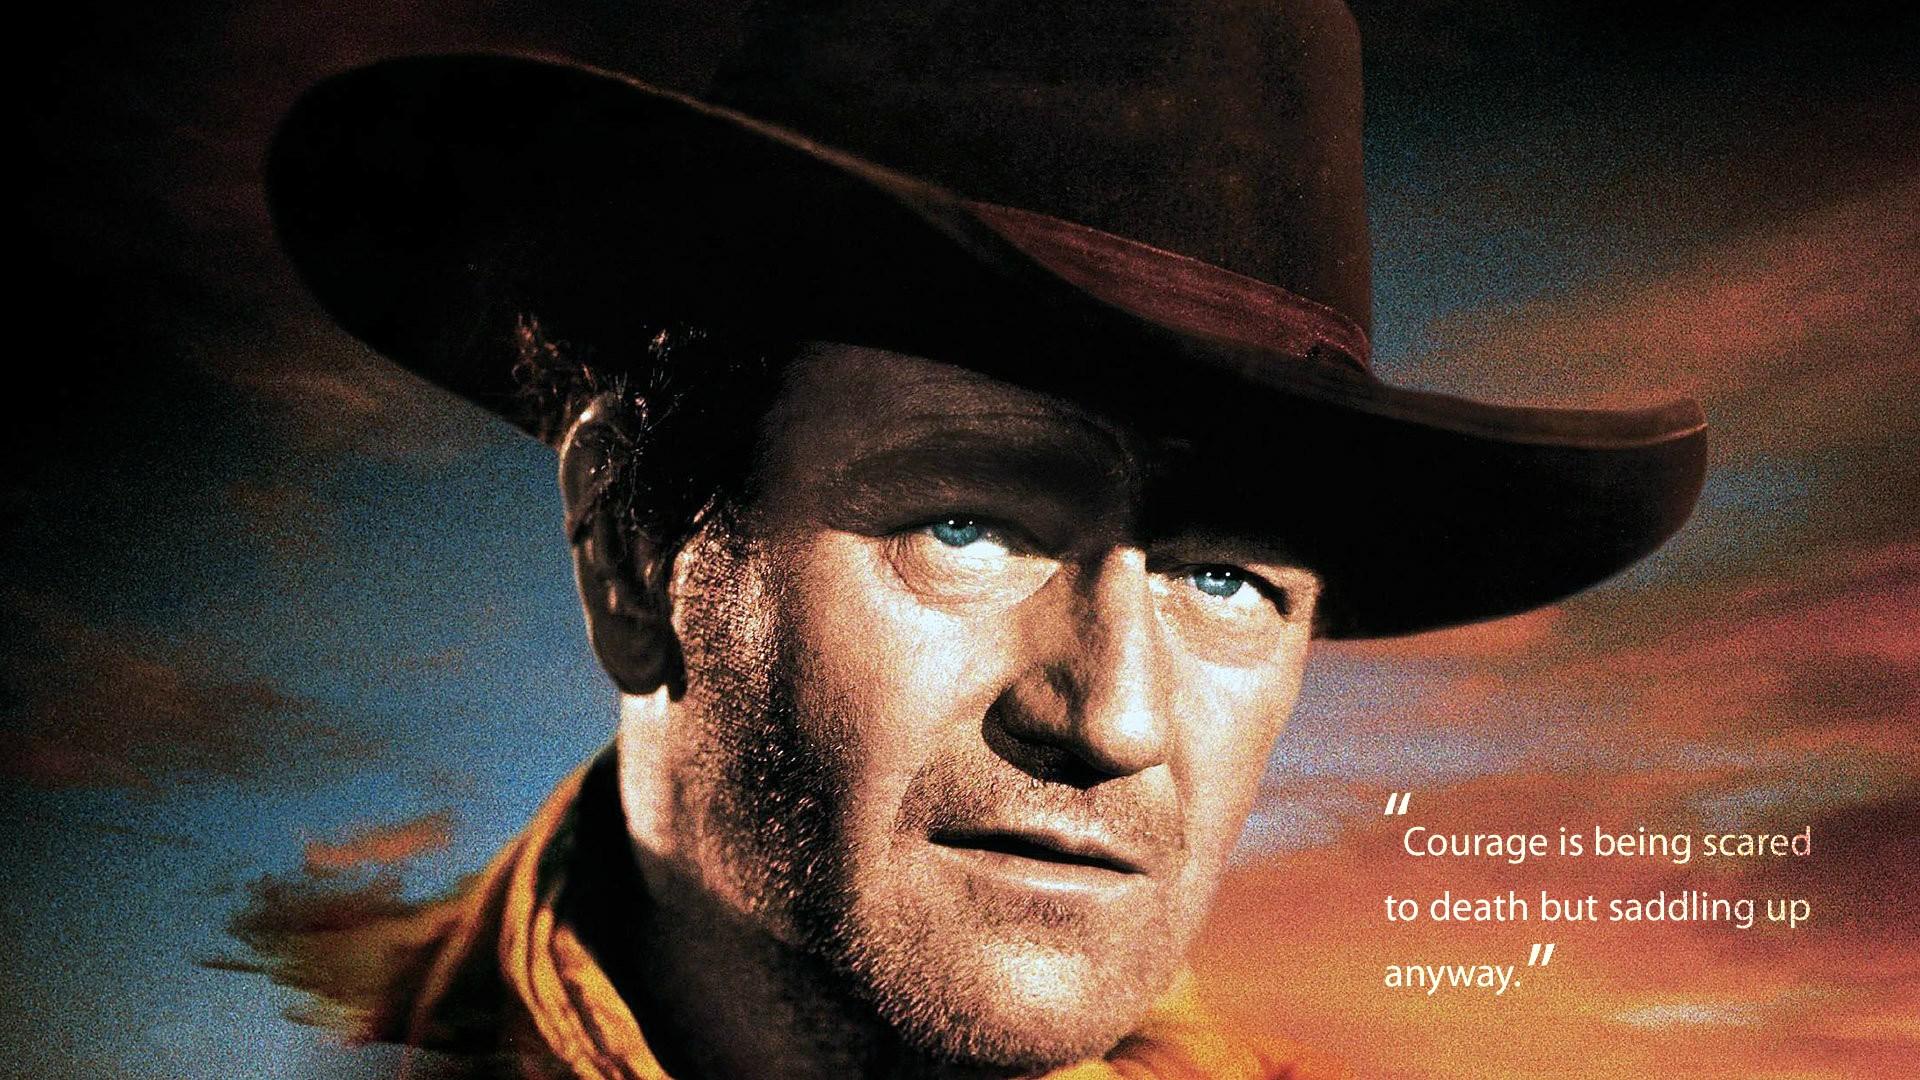 Download John Wayne Actor Images western movies Desktop Image 1920x1080